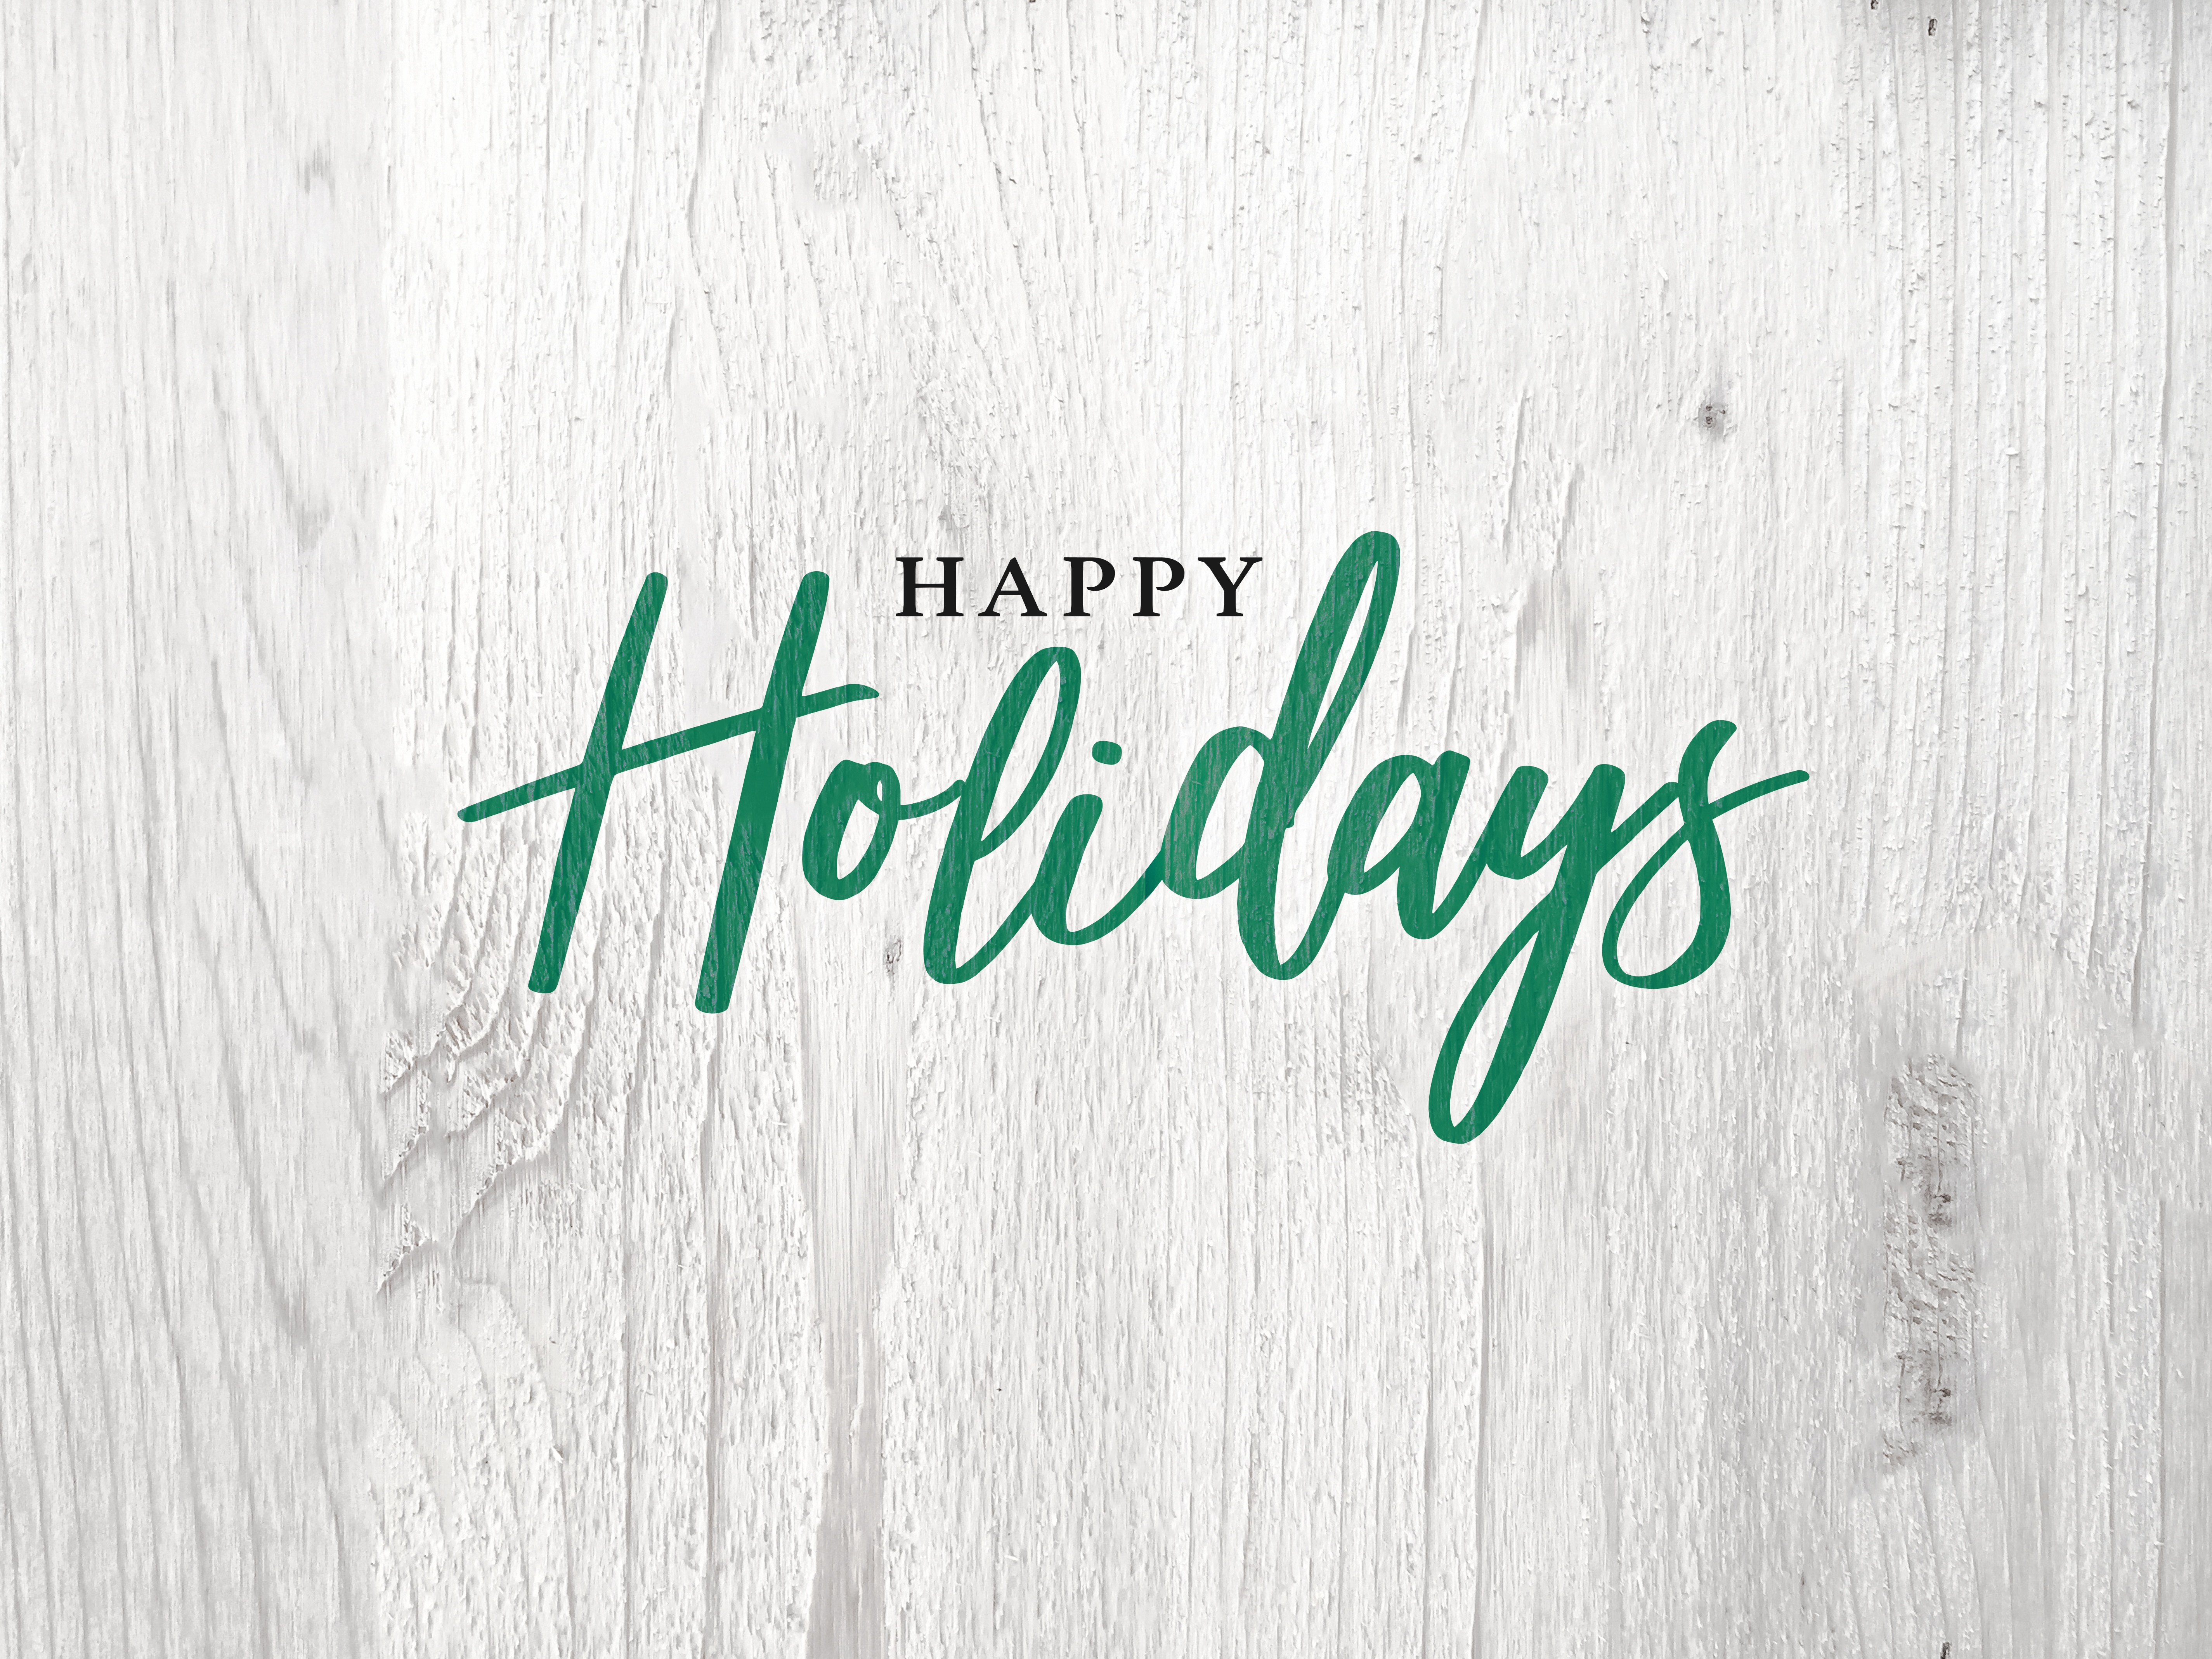 Happy Holiday Image.jpg